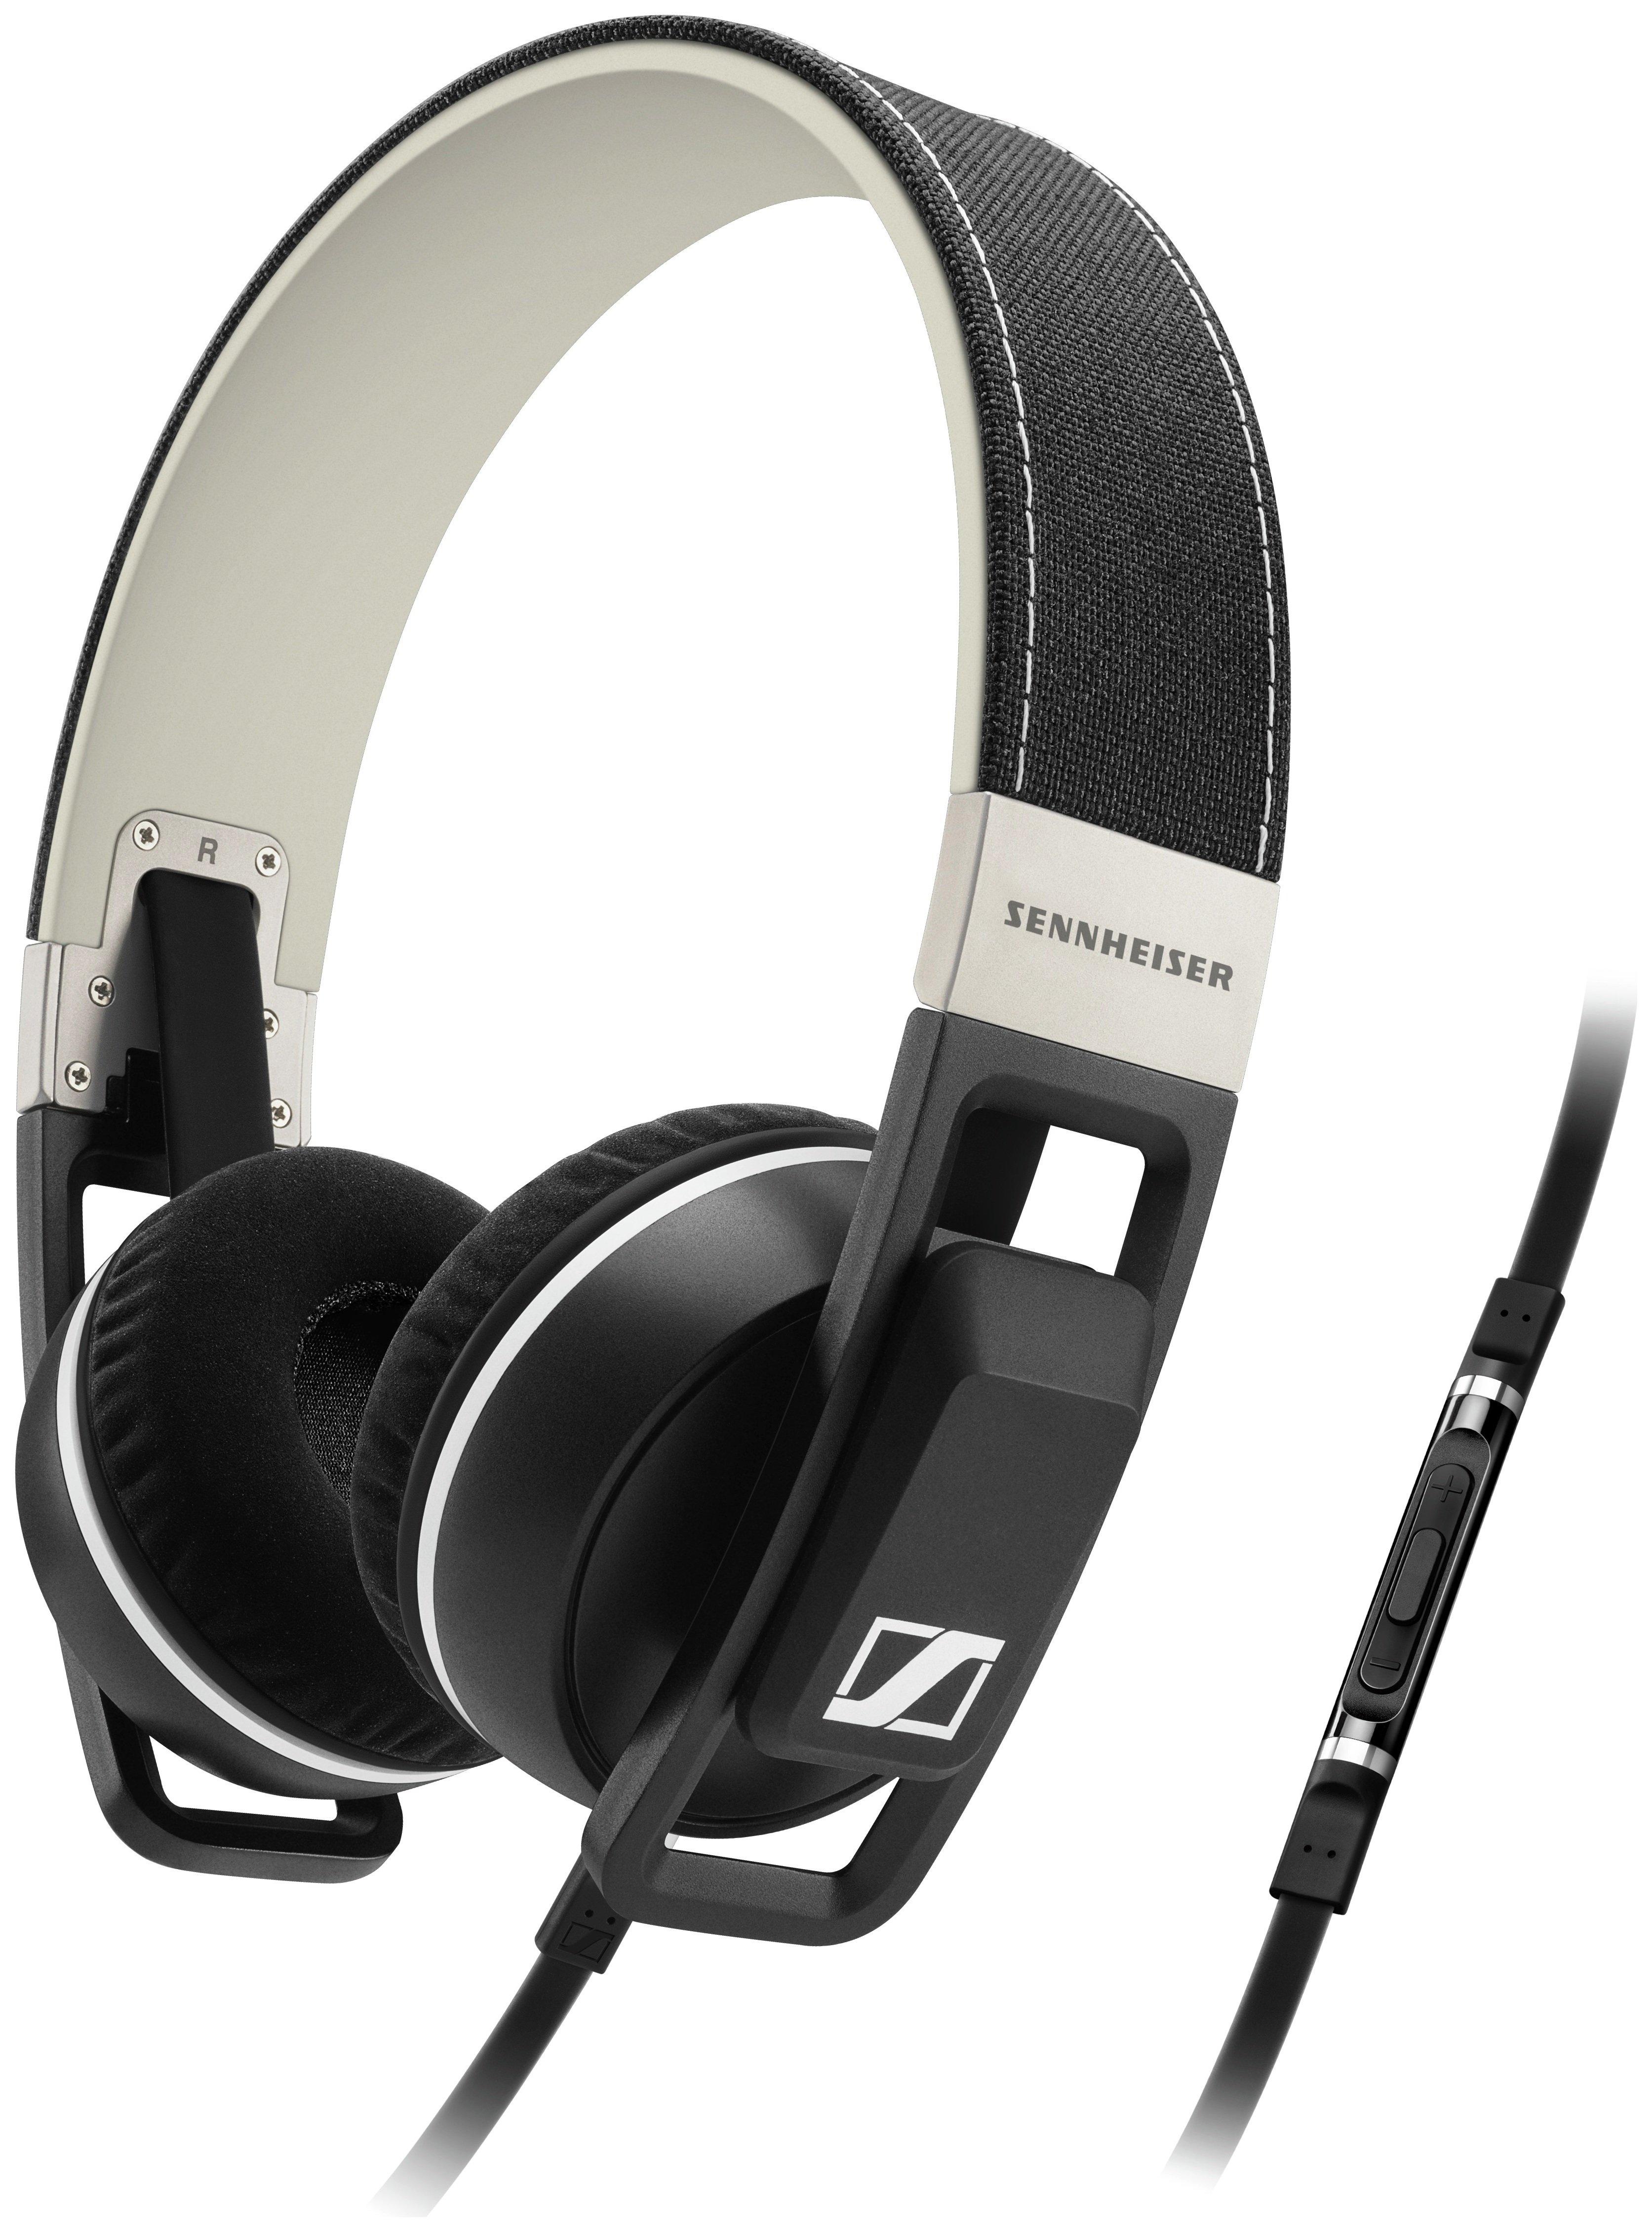 Sennheiser - Urbanite Headphones - Black